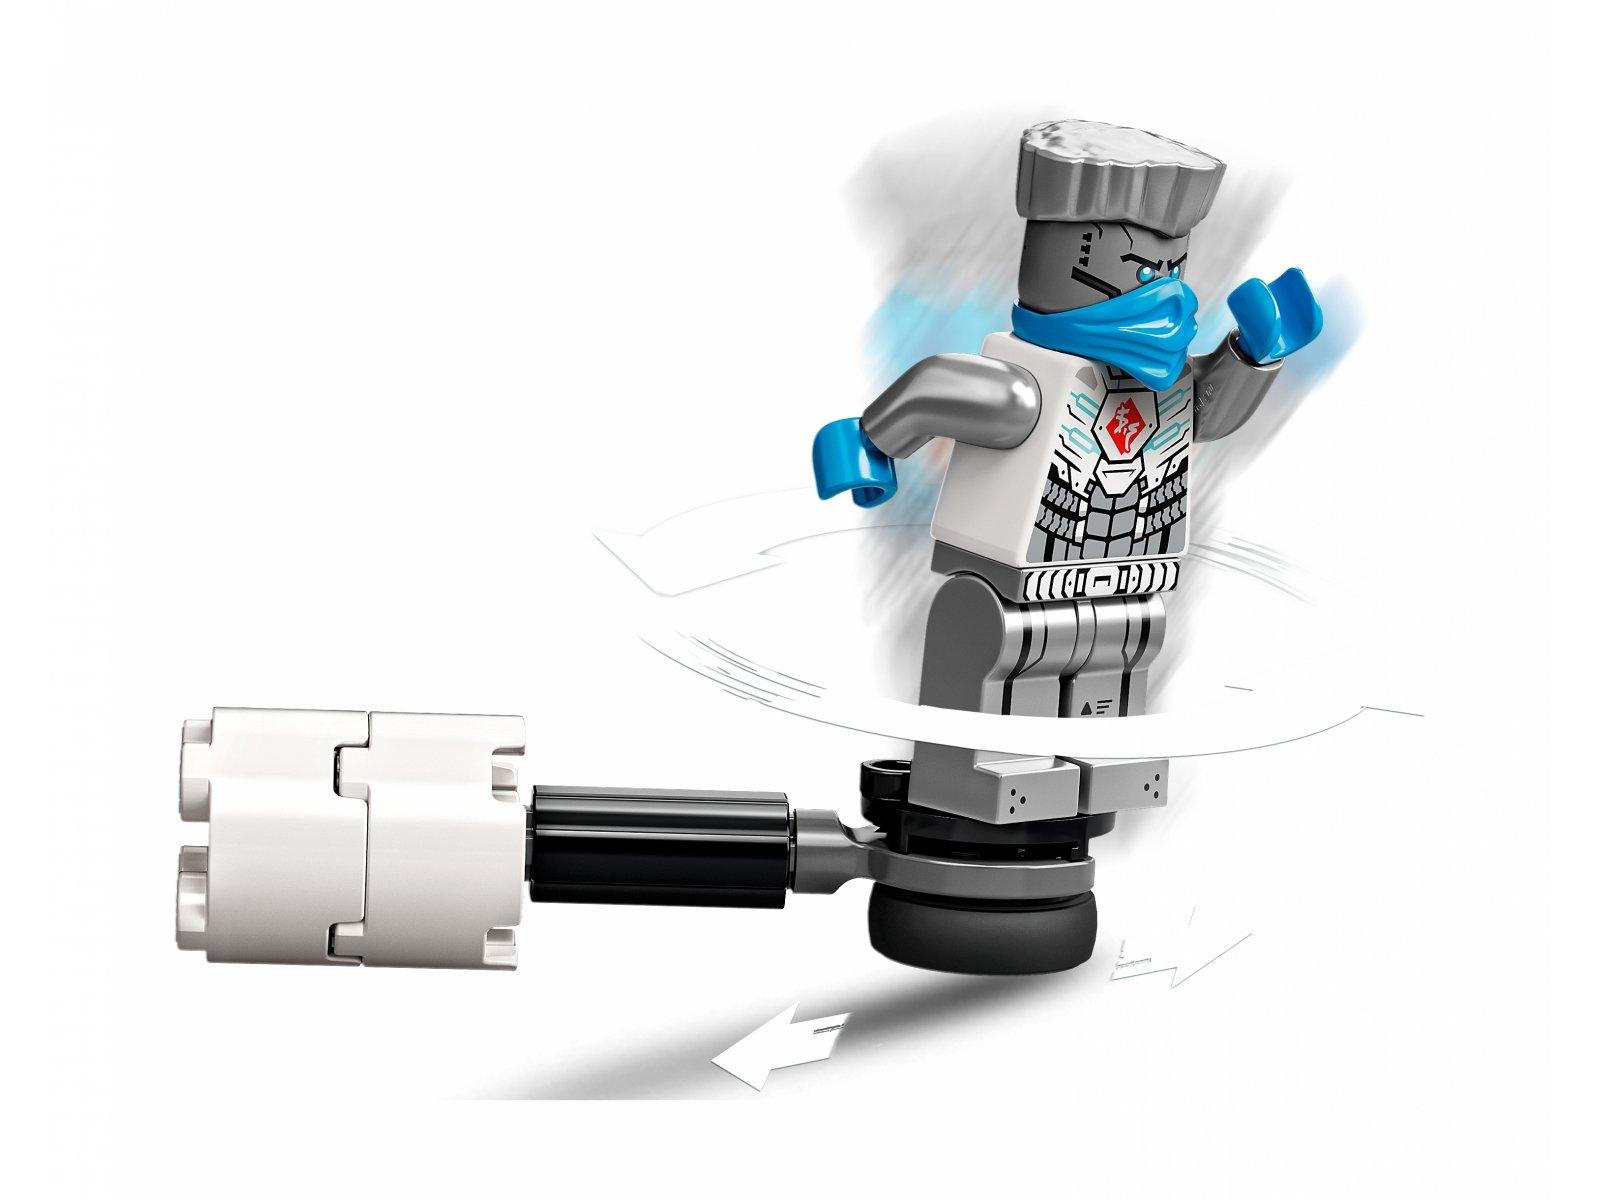 LEGO 71731 Ninjago Epicki zestaw bojowy - Zane kontra Nindroid